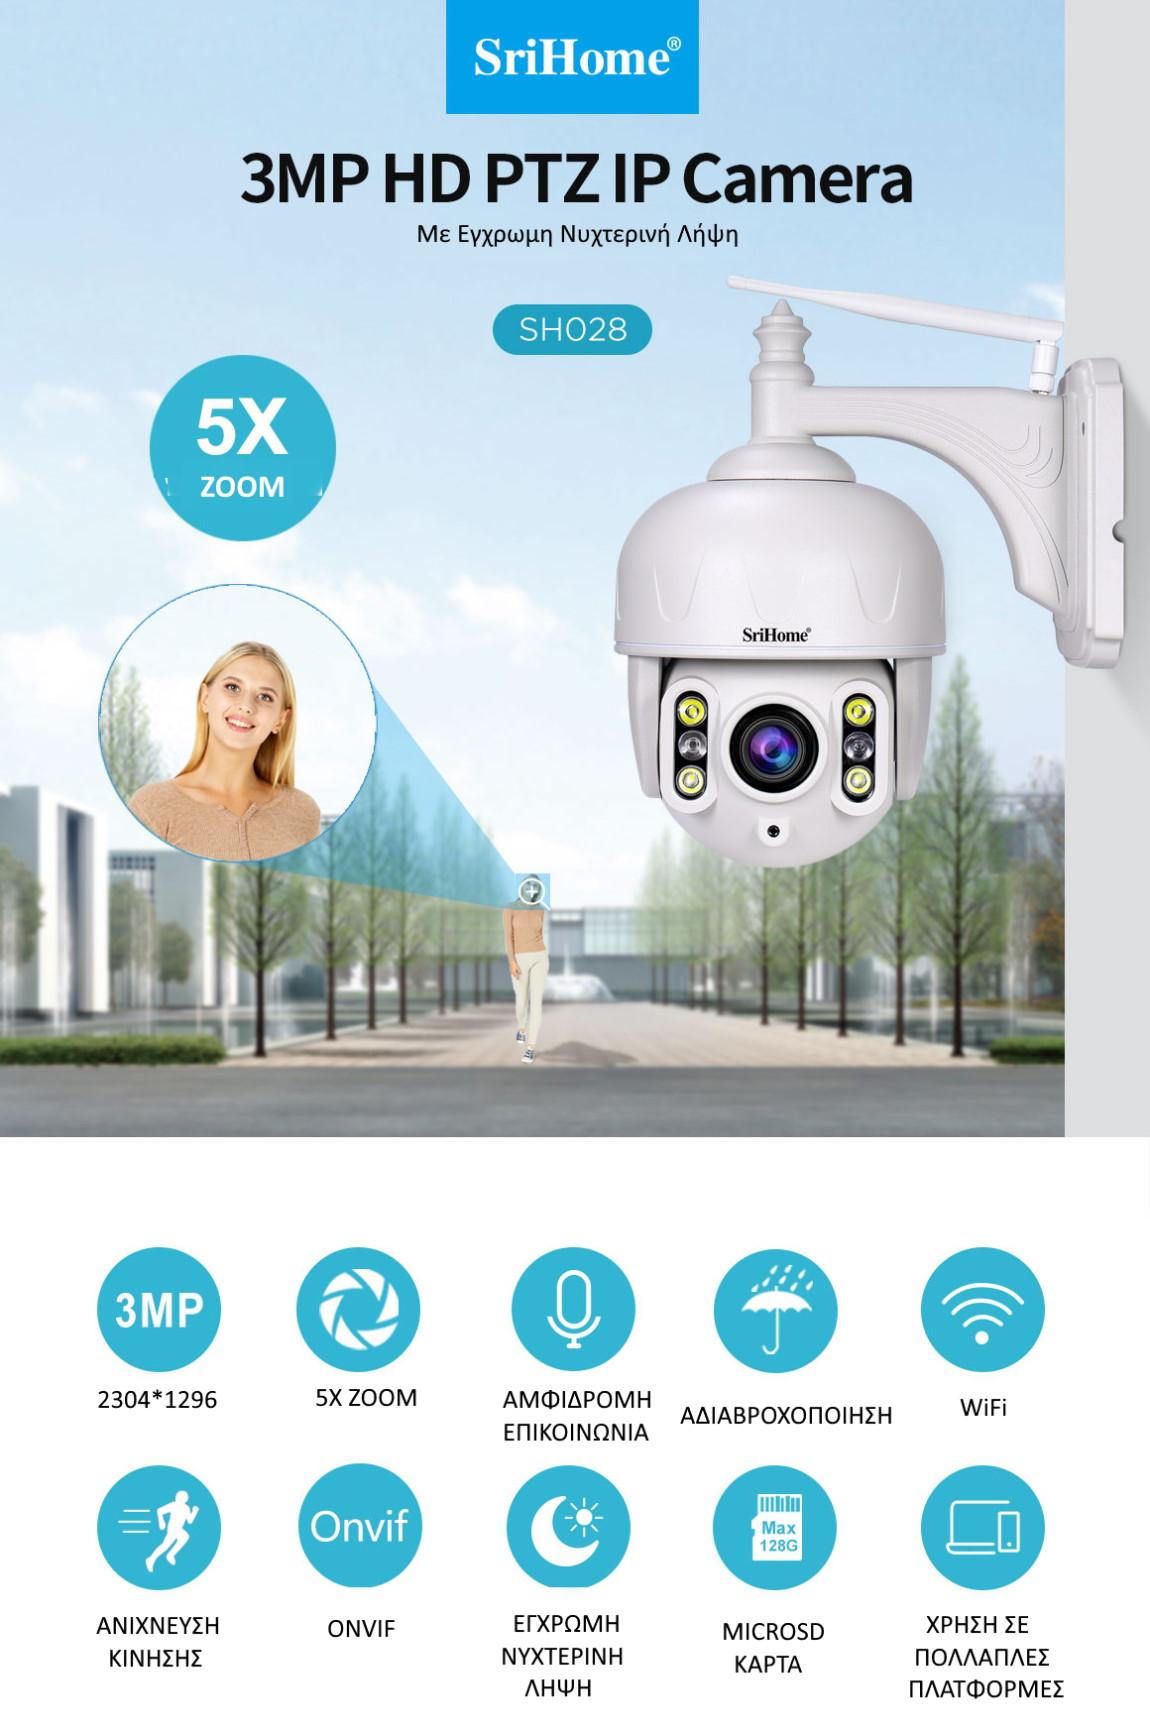 Srihome SH028 Κάμερα Ασφαλείας IP Εξωτερικού Χώρου